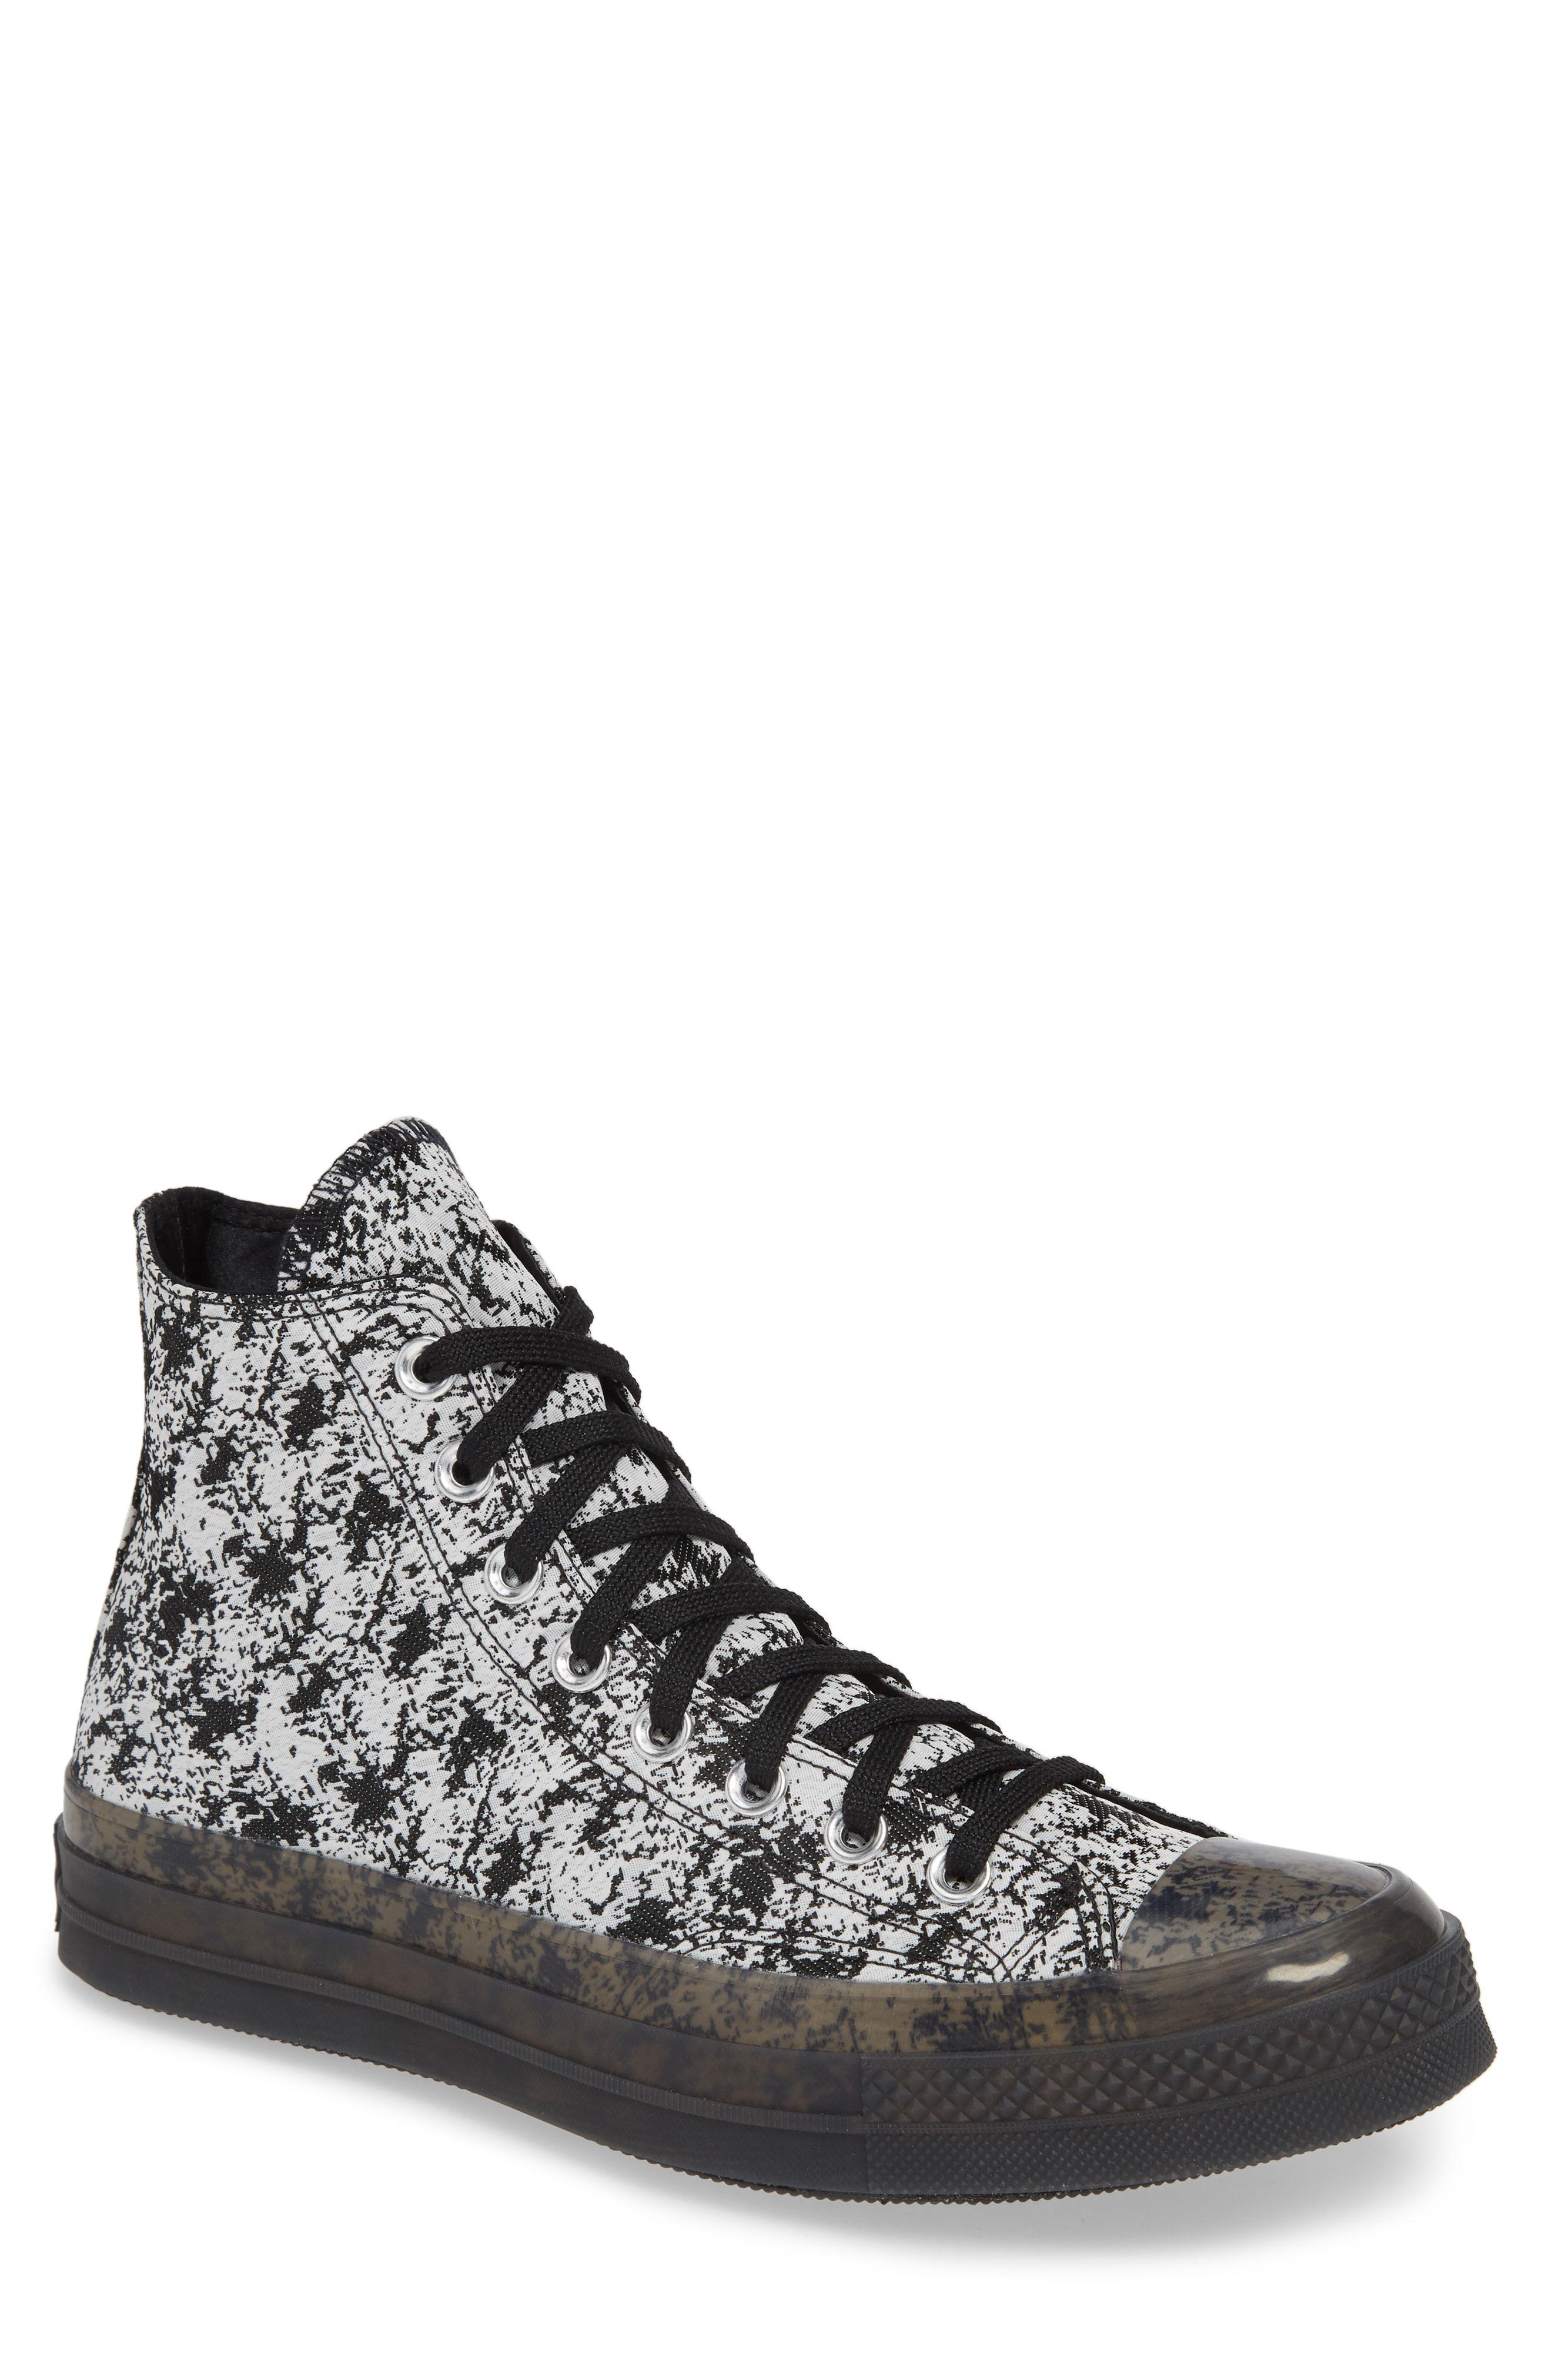 65eb158f164a CONVERSE CHUCK TAYLOR ALL STAR 70 HIGH TOP JACQUARD SNEAKER.  converse   shoes